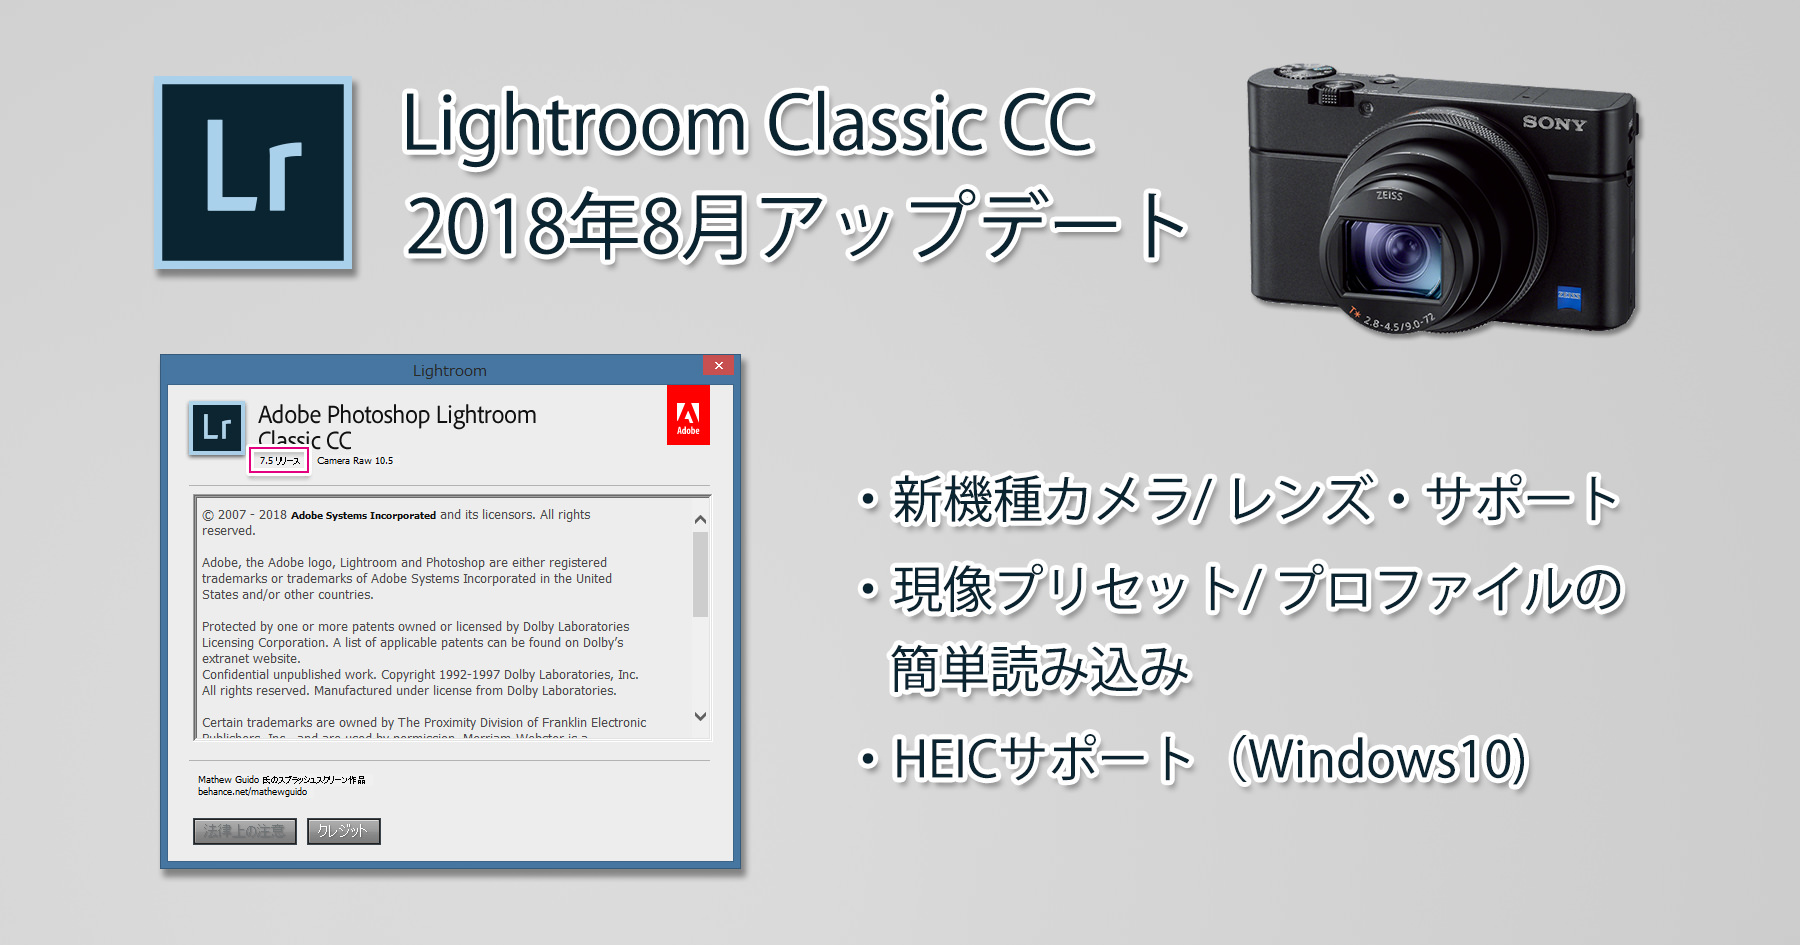 Lightroom_Classic_CC-2018年8月アップデート-Main